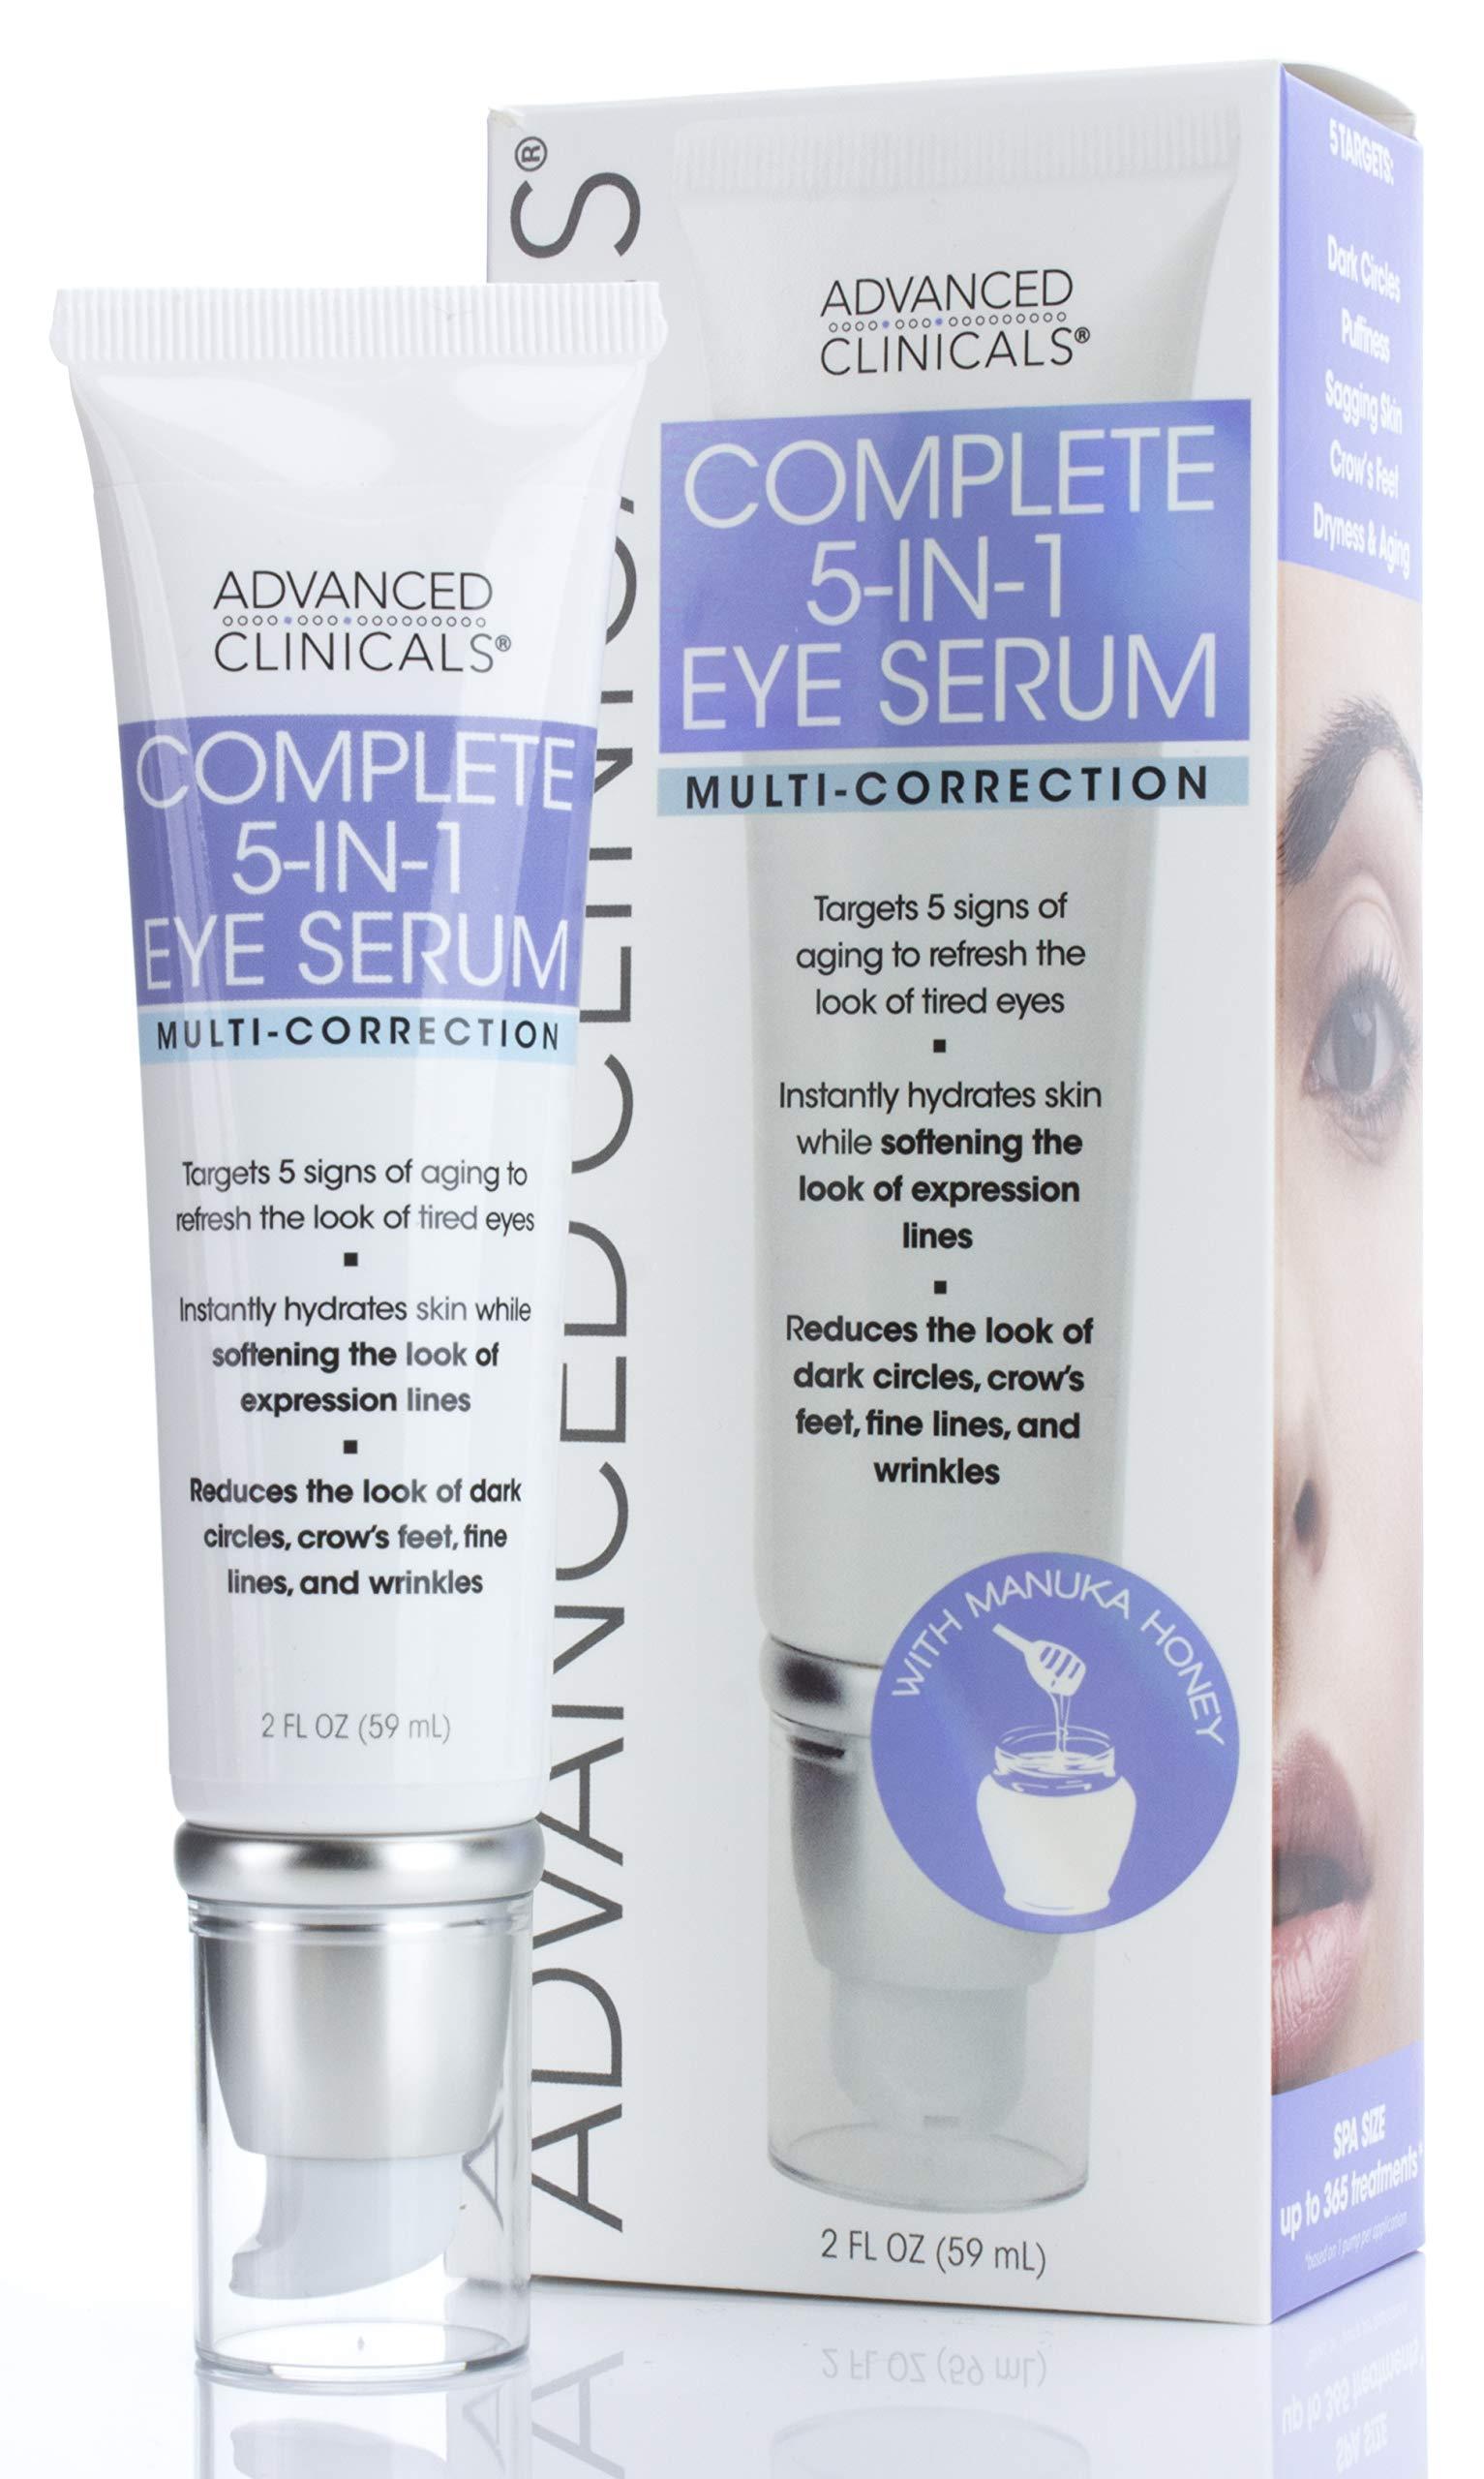 Advanced Clinicals 5-in-1 Multi Correction Anti-Aging Eye Serum w/Retinol, Collagen, Vitamin C, Manuka Honey. For dark circles, wrinkles, crow's feet, fine lines. Large 2oz (2oz) by Advanced Clinicals